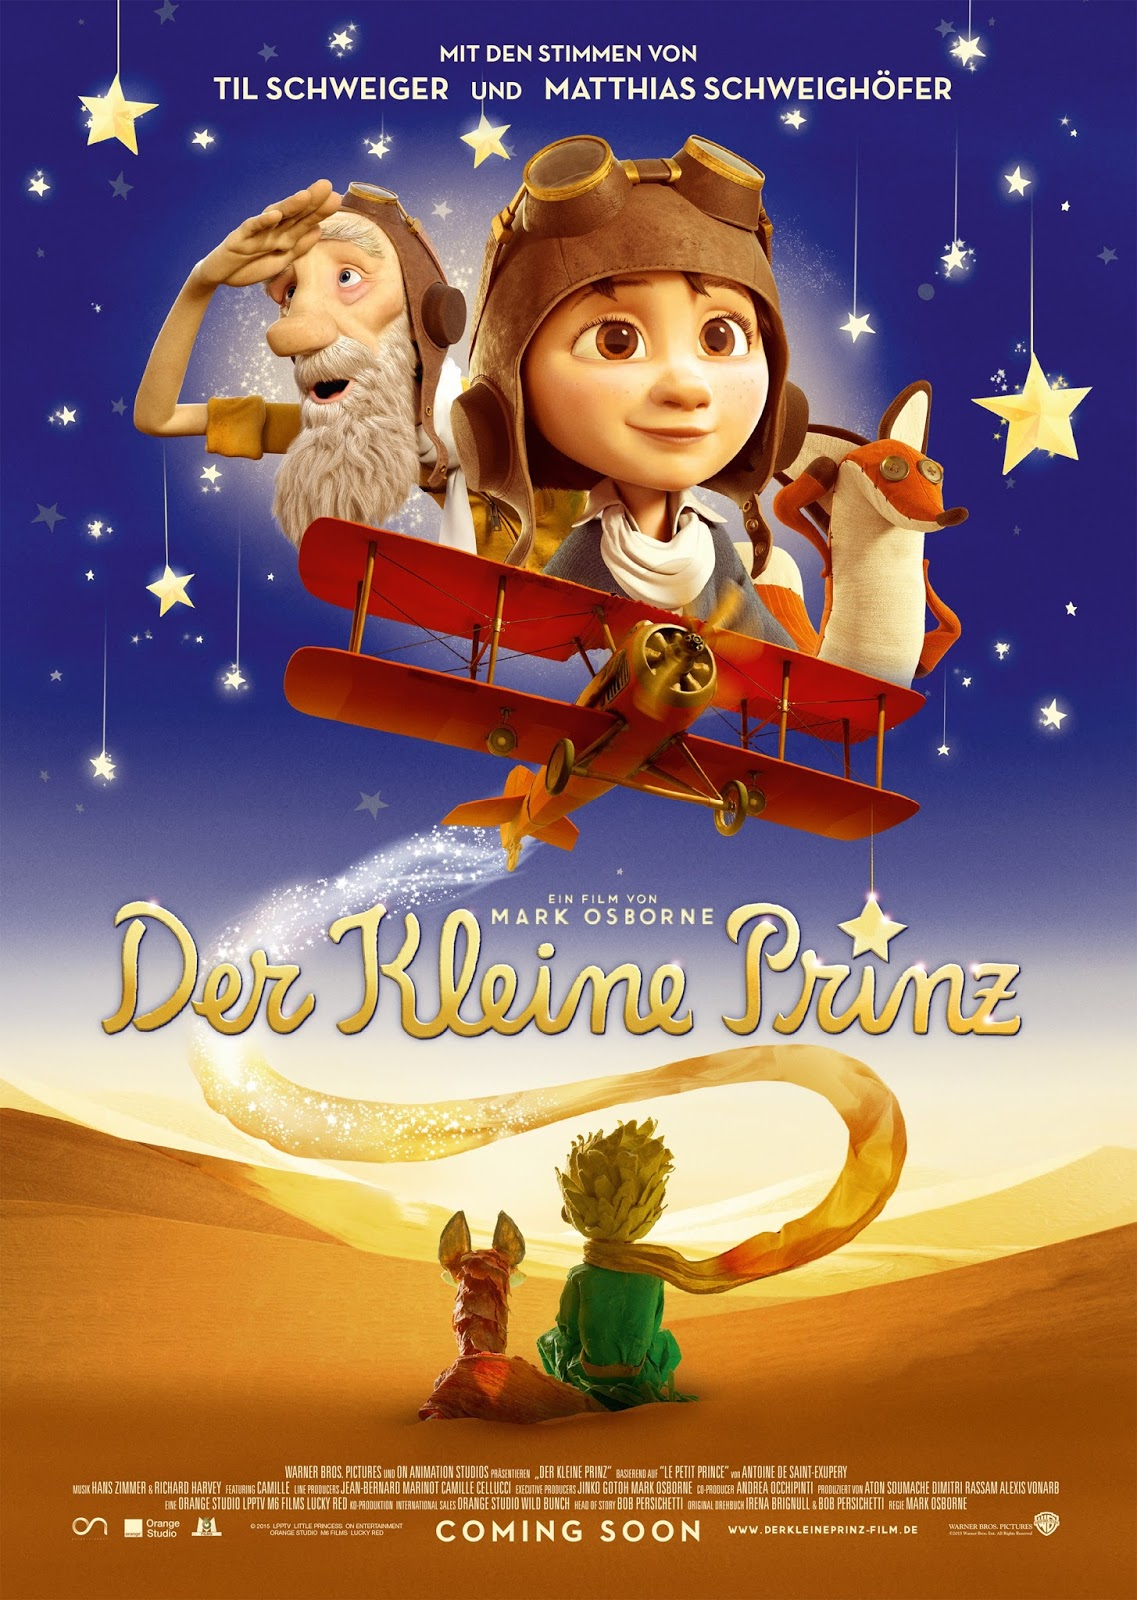 Filme O Pequeno Principe 2015 throughout o pequeno príncipe e eu : o pequeno principe filme 2015 foi o